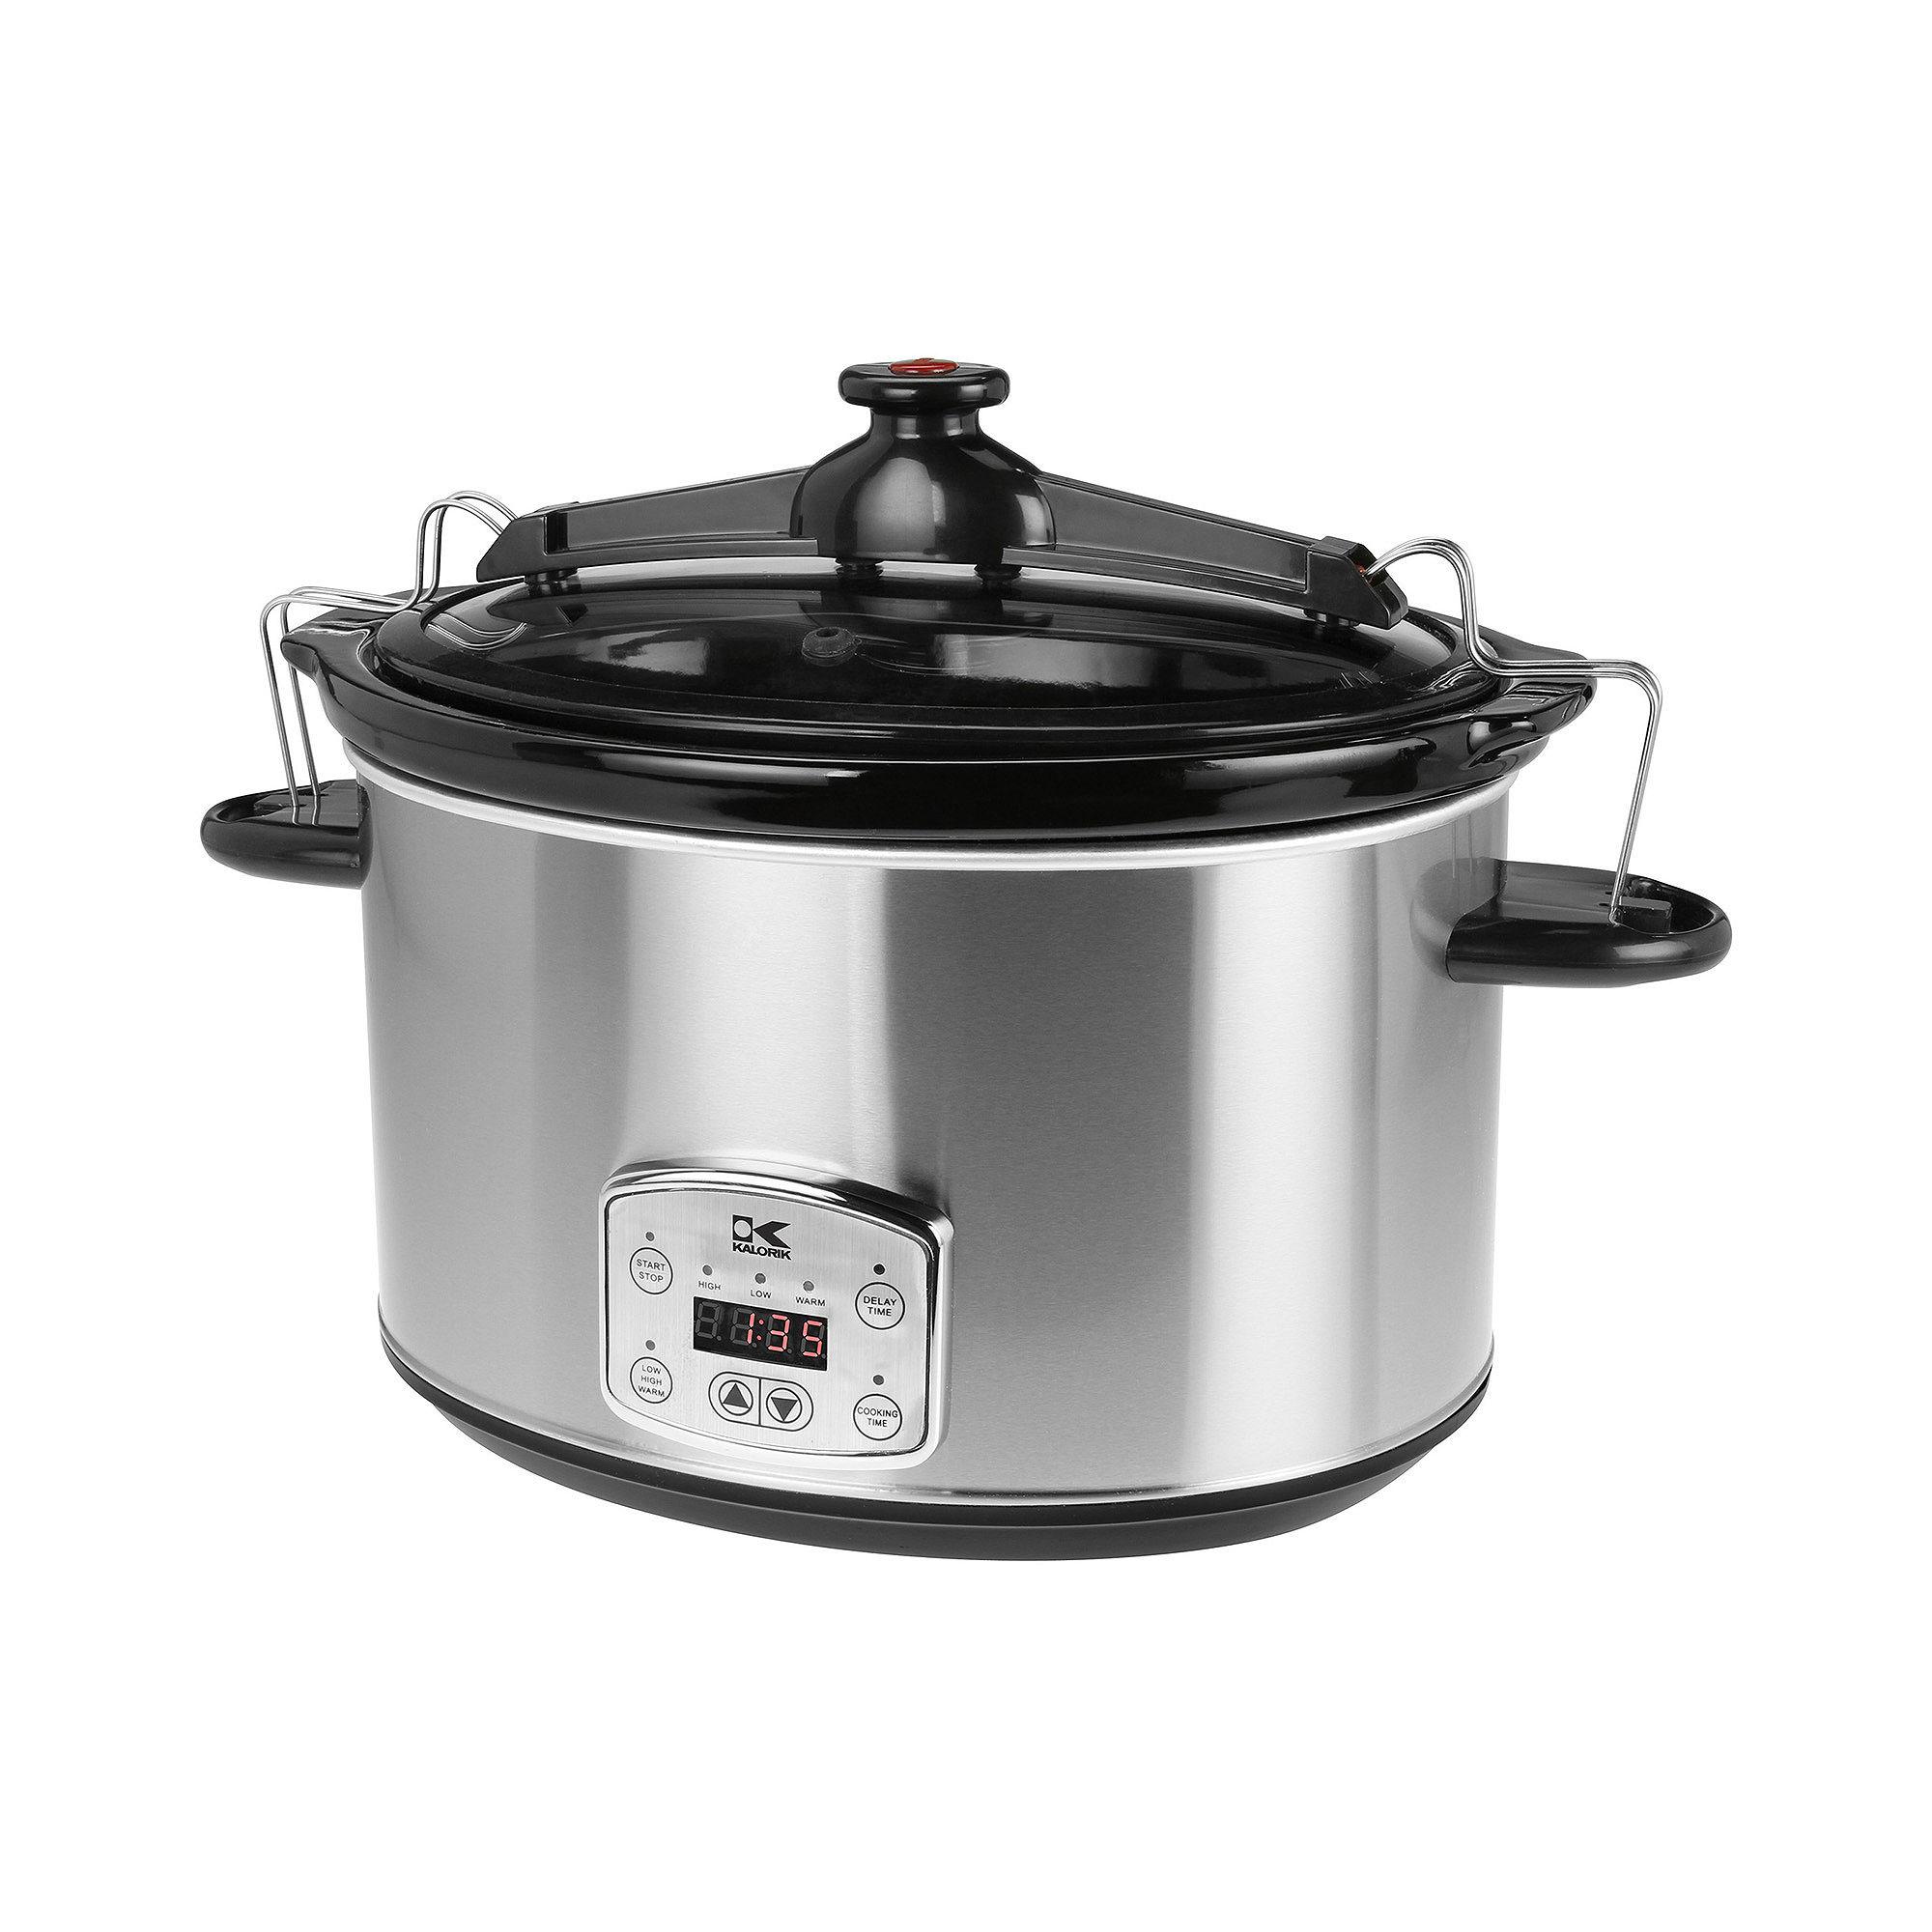 Kalorik 8-qt. Stainless Steel Digital Slow Cooker with Locking Lid